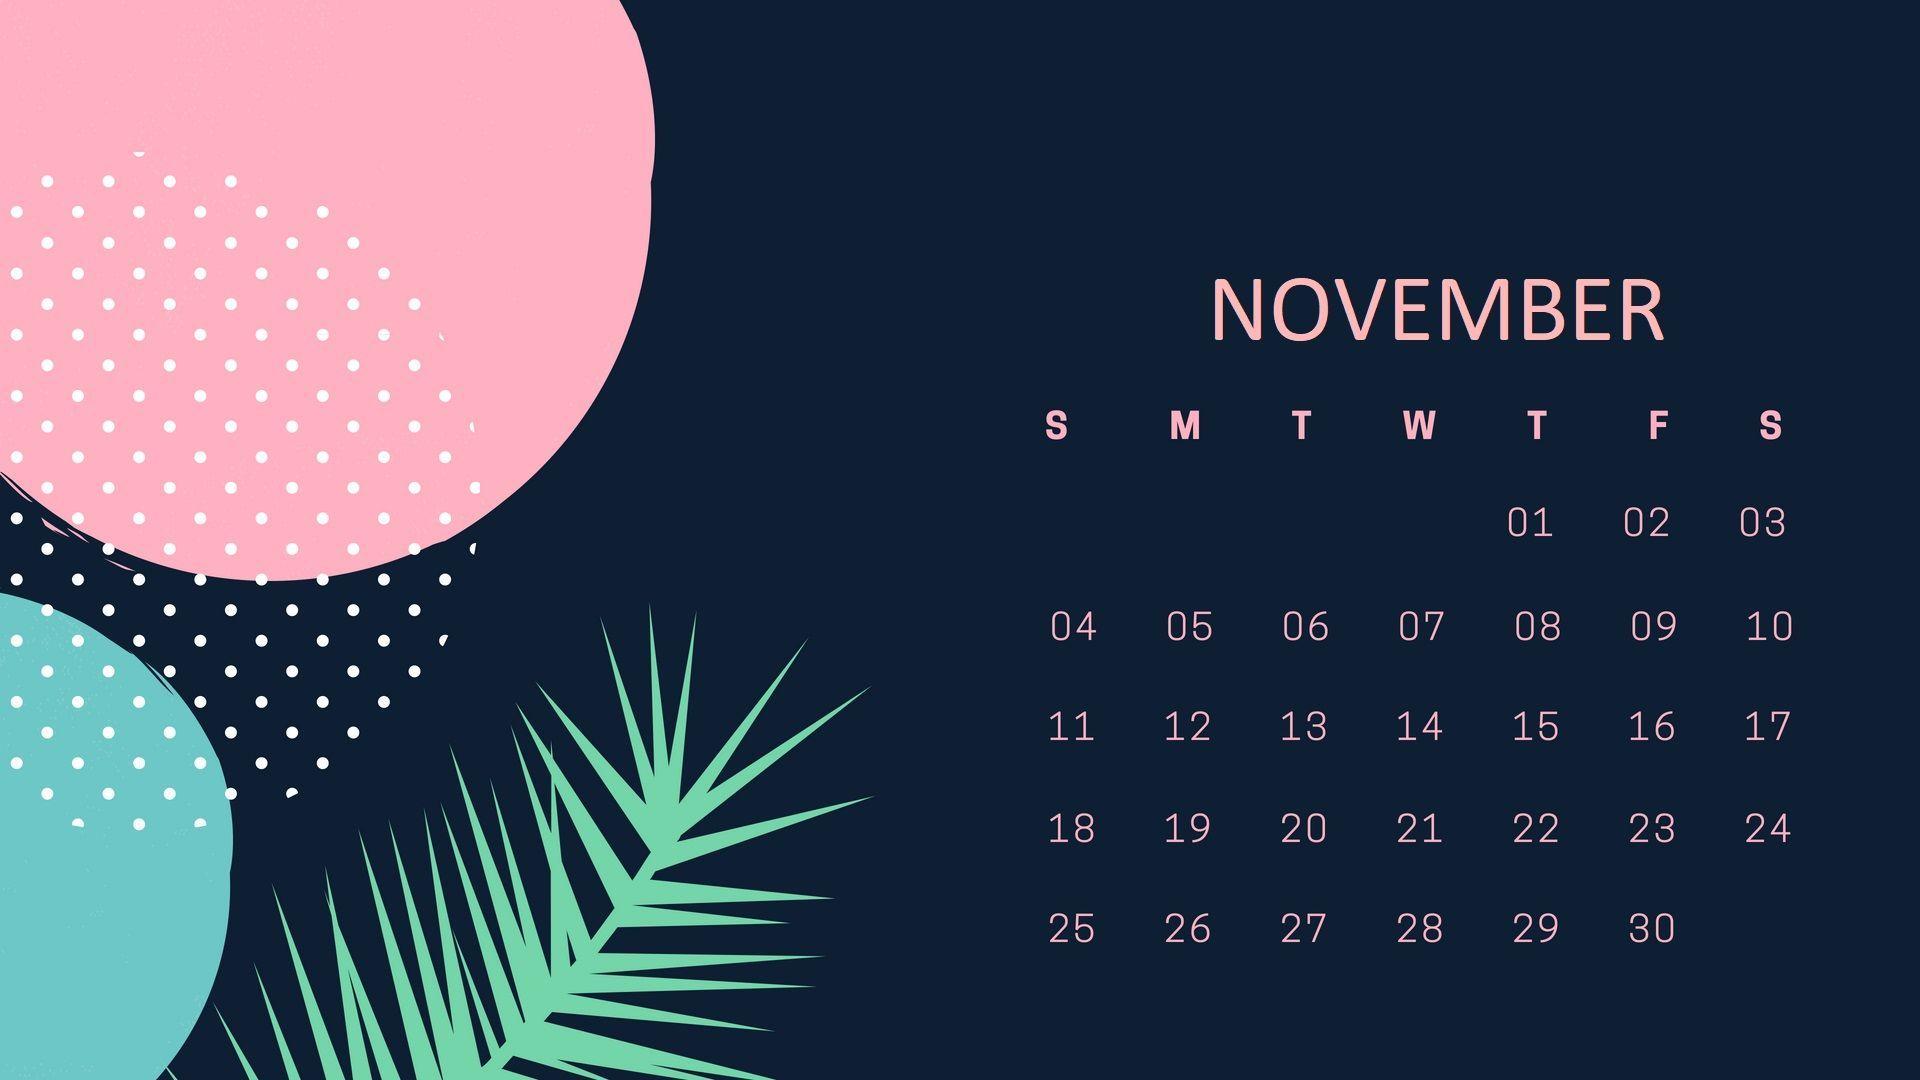 November 2018 Calendar Wallpaper Calendar Wallpaper Phone Wallpaper Design Wallpaper